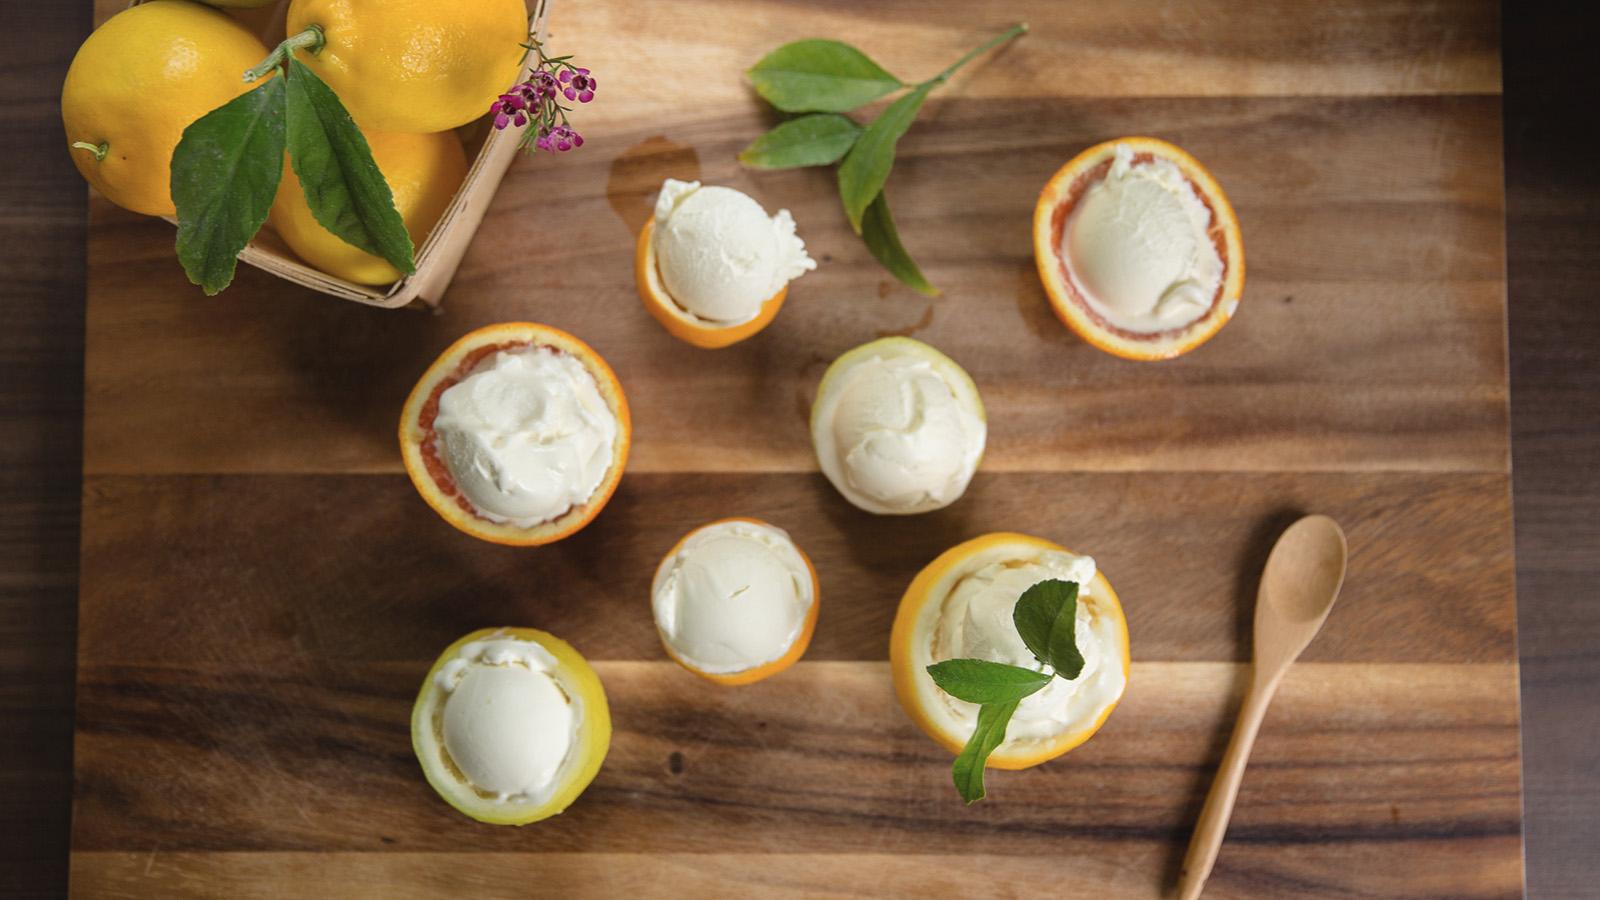 gelato ice cream maker instructions